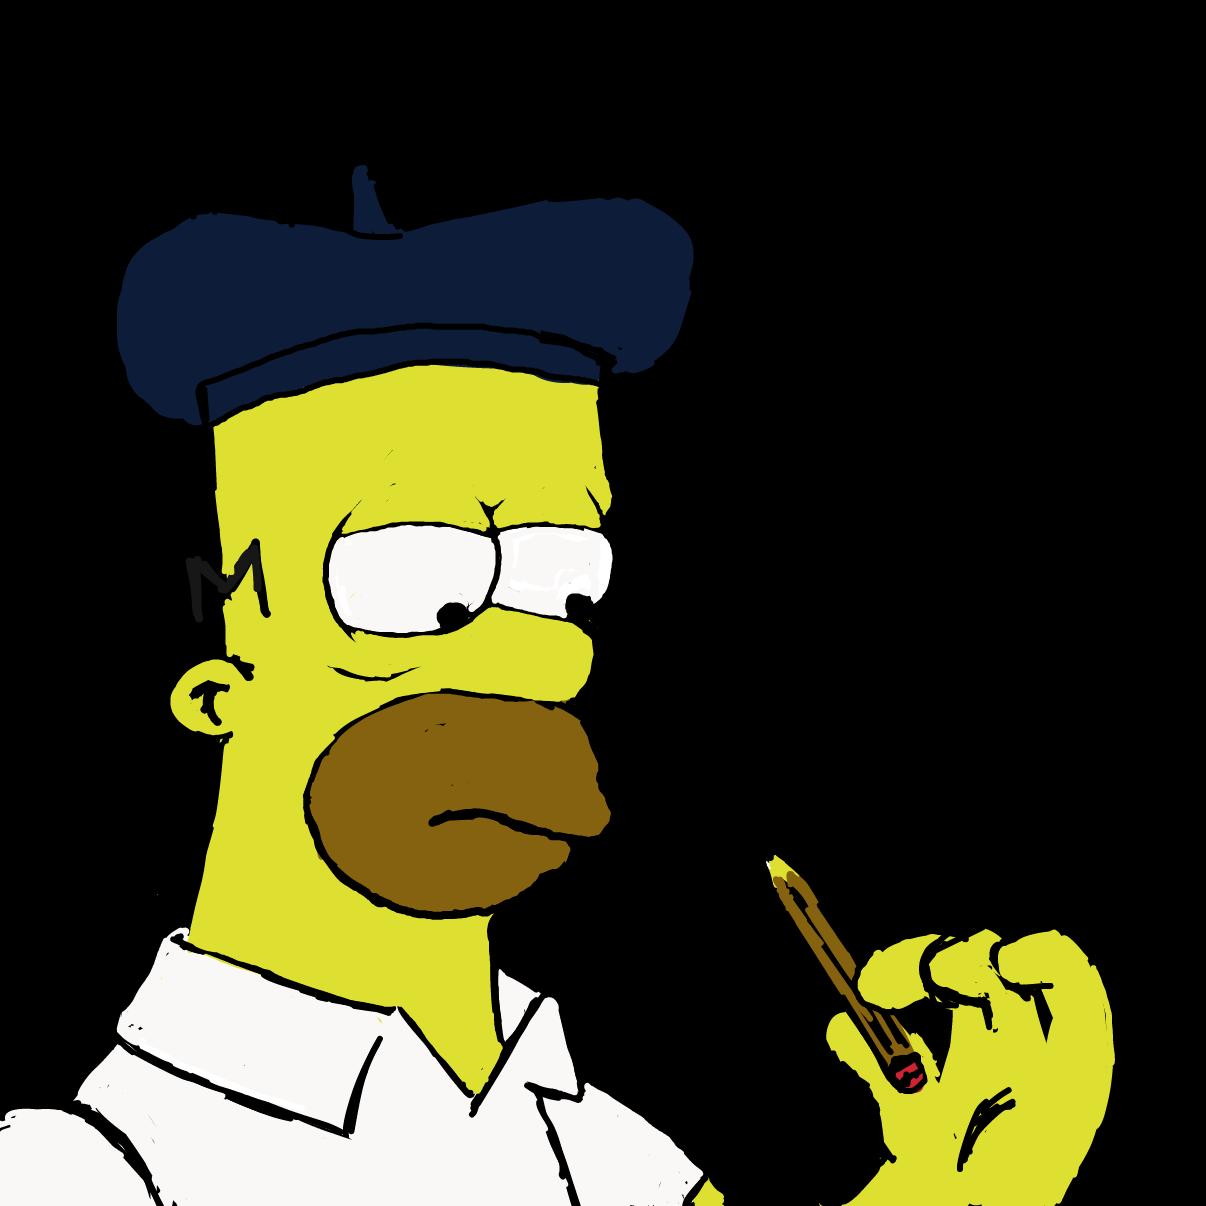 Profile picture for the comic artist, kozelArt